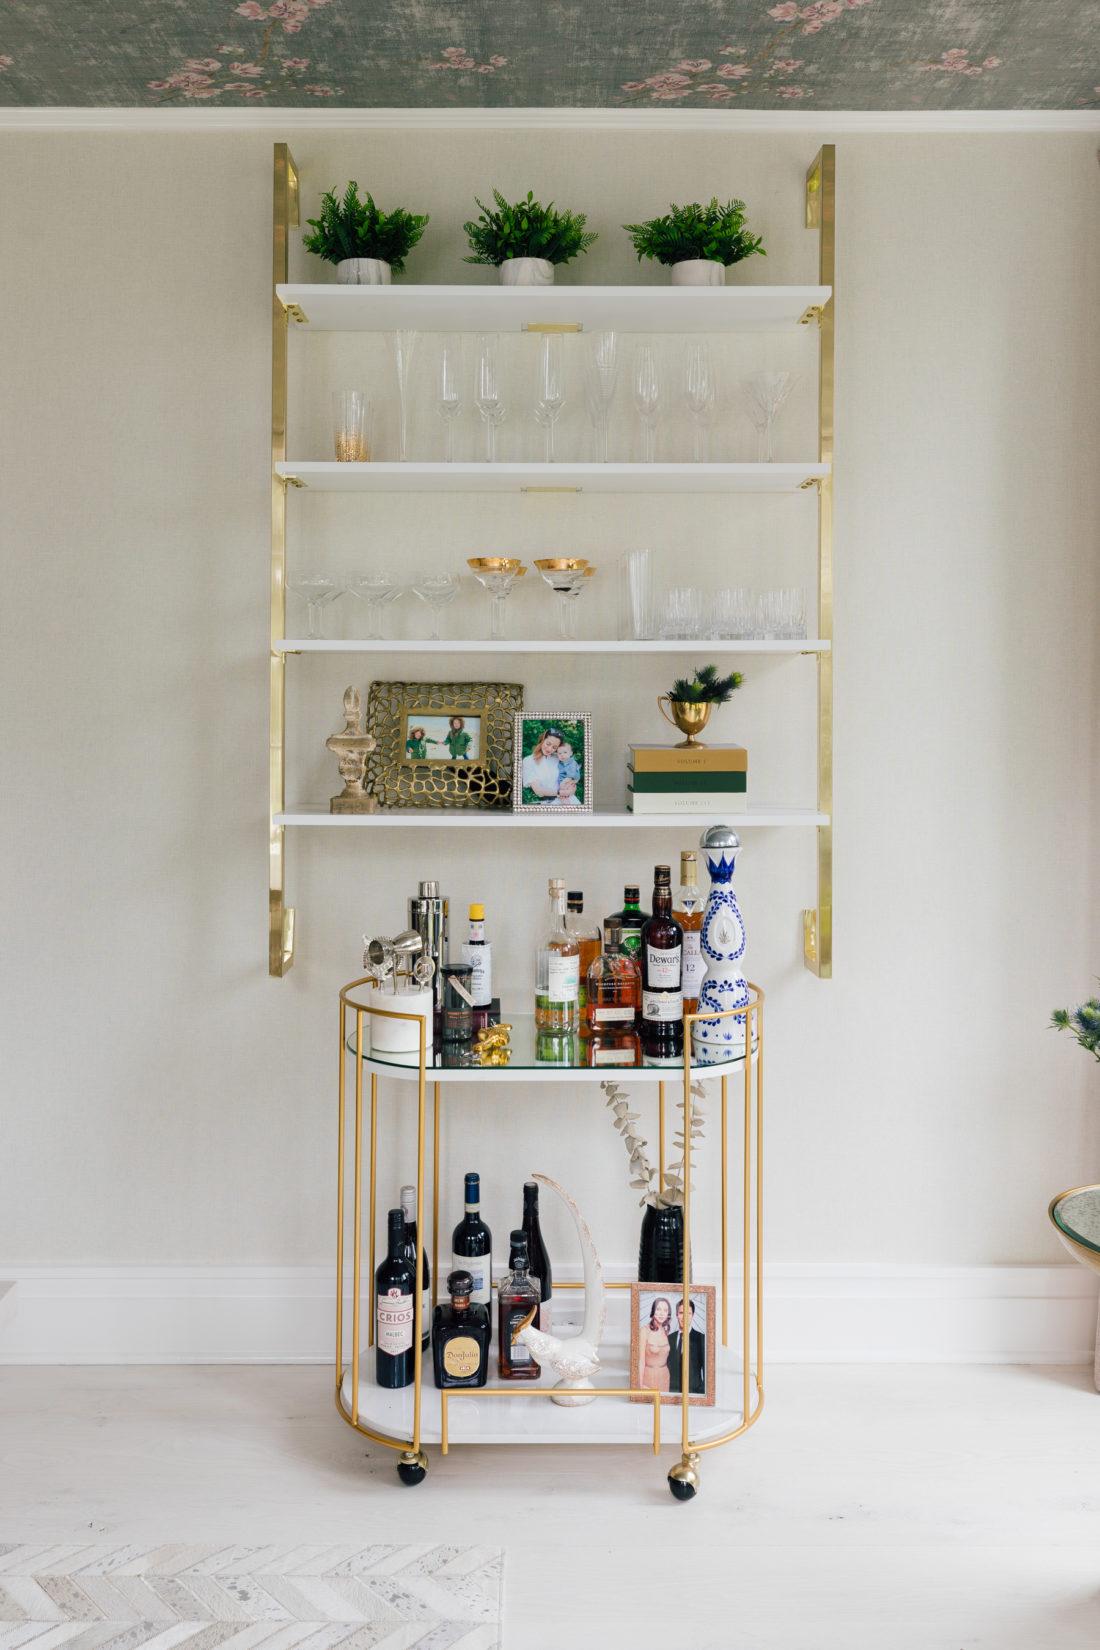 The bar cart and wall shelving in Eva Amurri Martino's newly renovated dining room